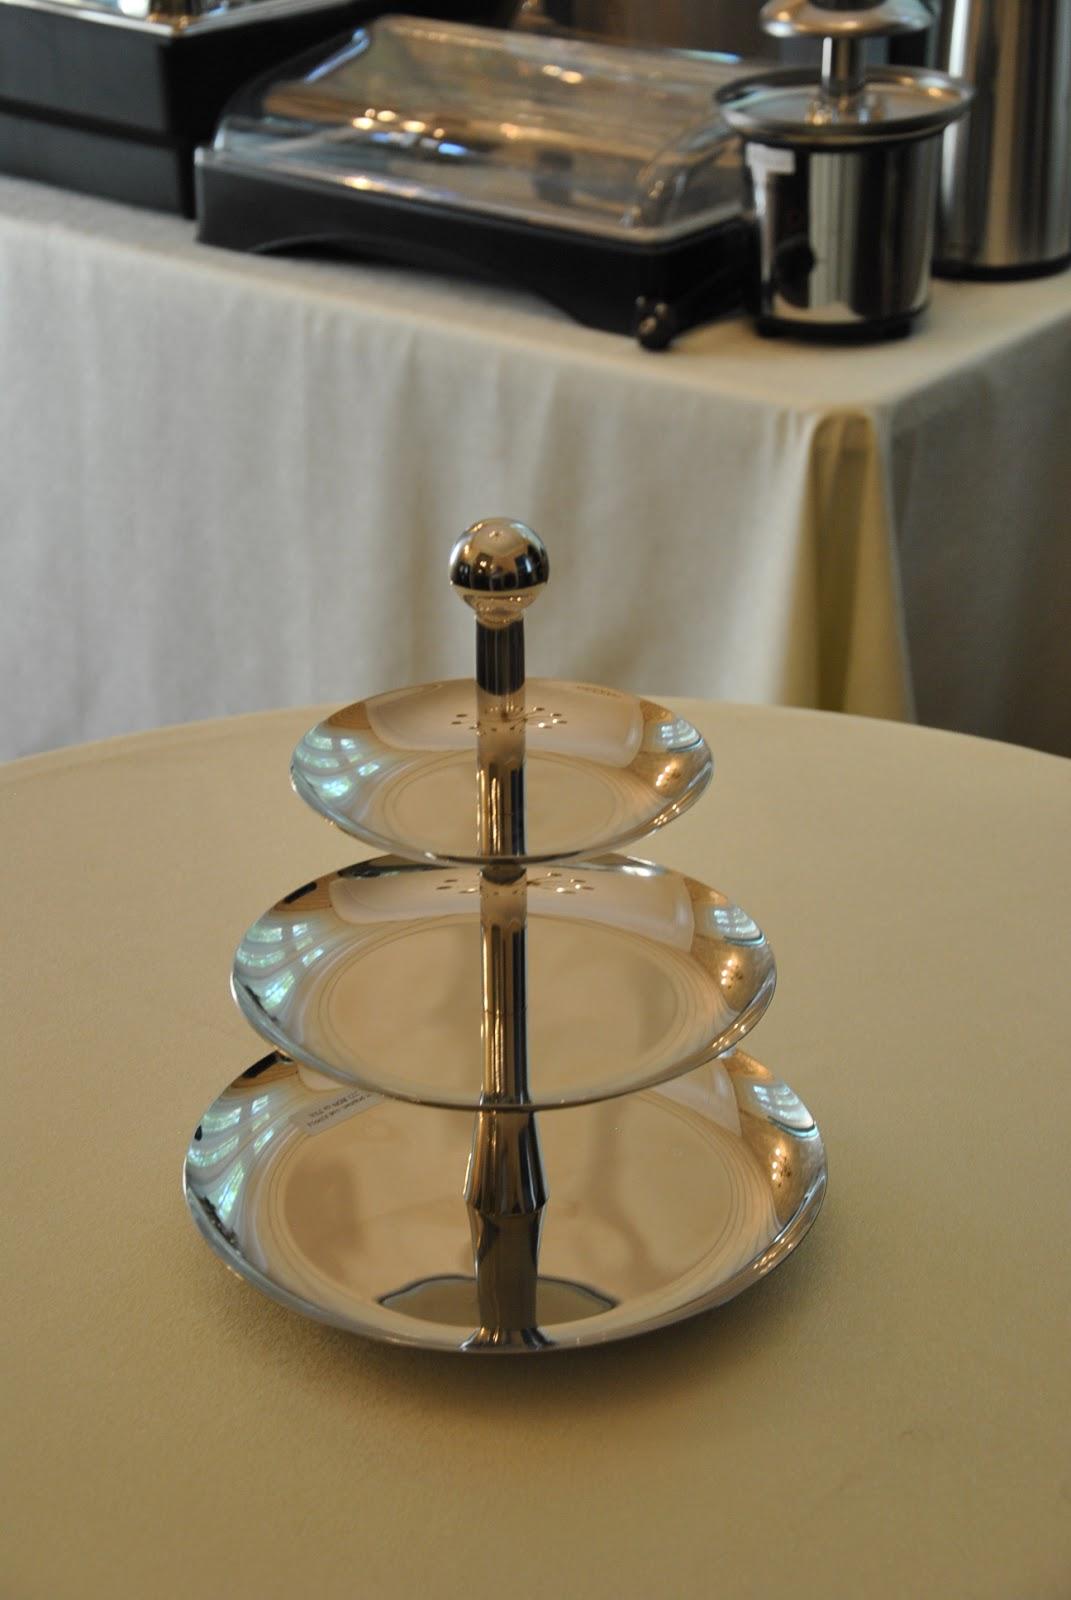 Stand, suport din otel inoxidabil pentru prajituri- produs profesional horeca- PRET